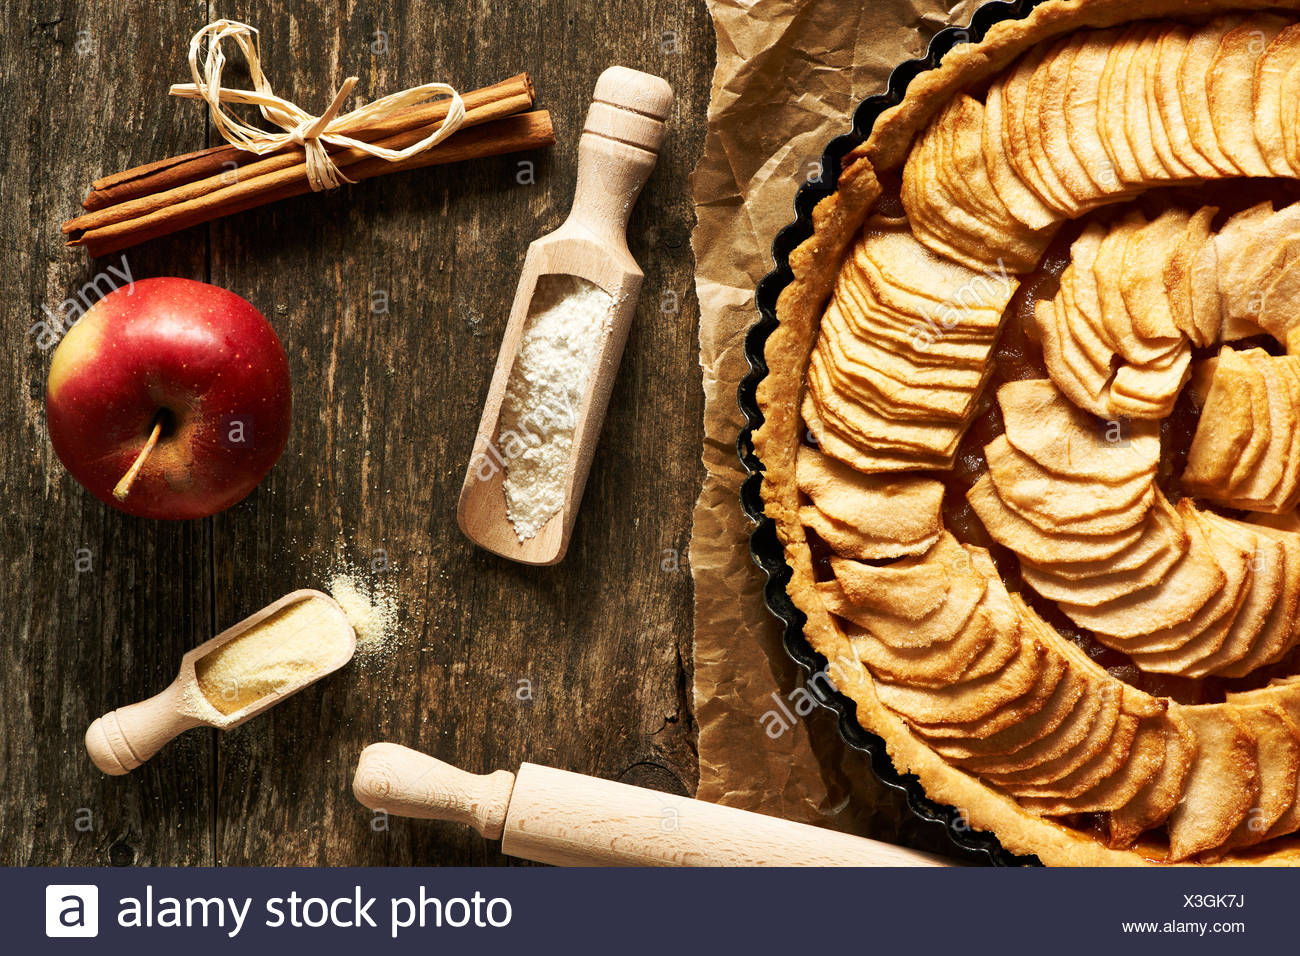 French apple pie - Stock Image